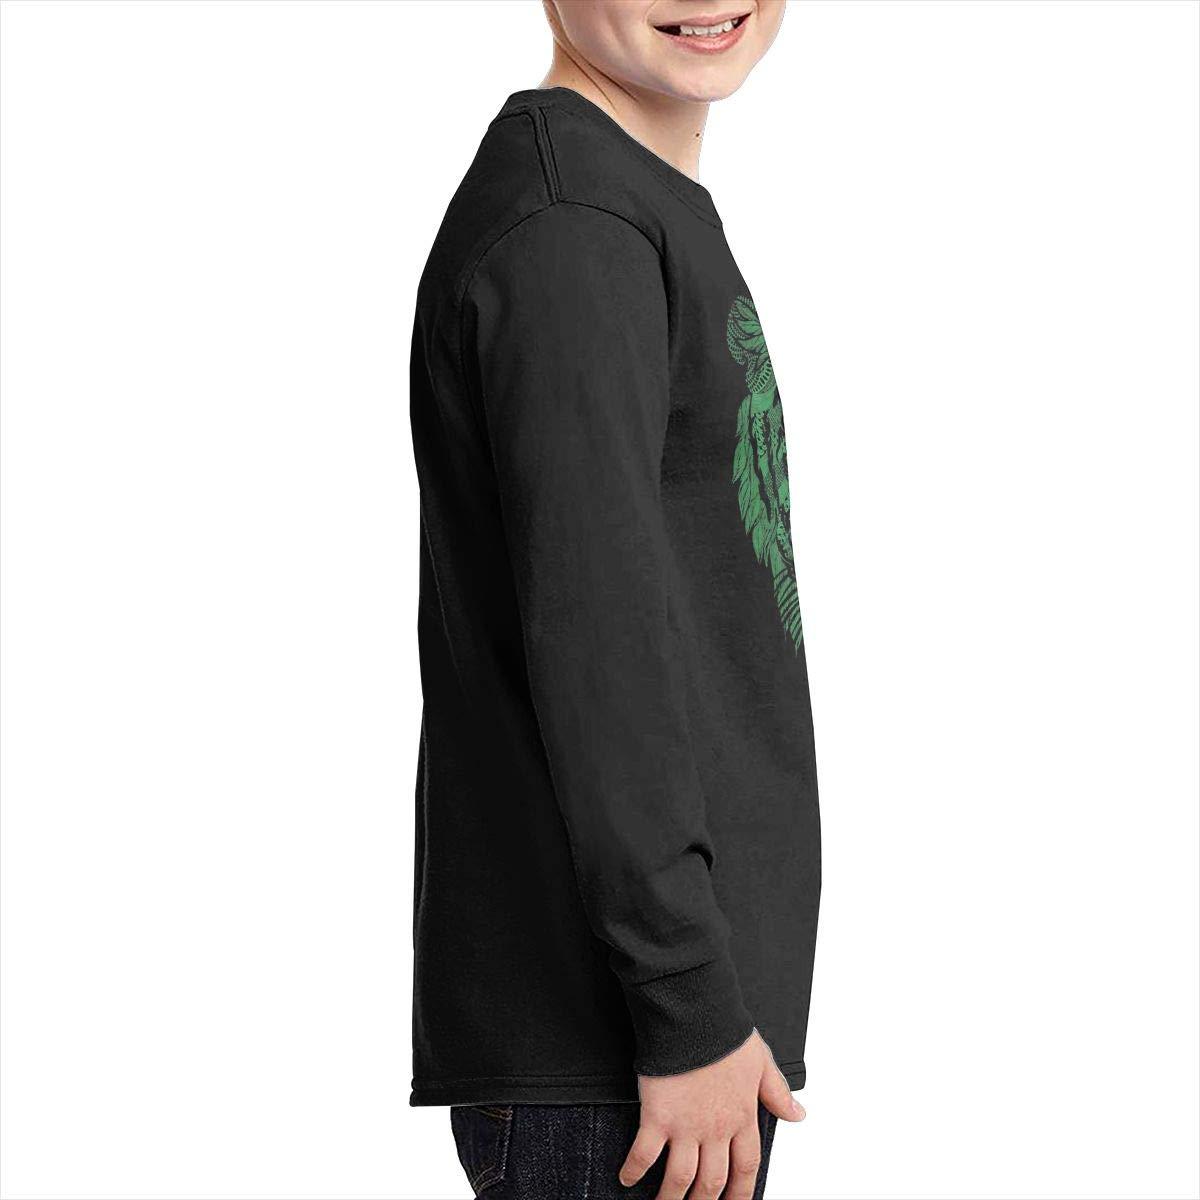 Websi Wihey Bigfoot I Believe Boys /& Girls Gray t-Shirt Unisex Fashion T Shirts